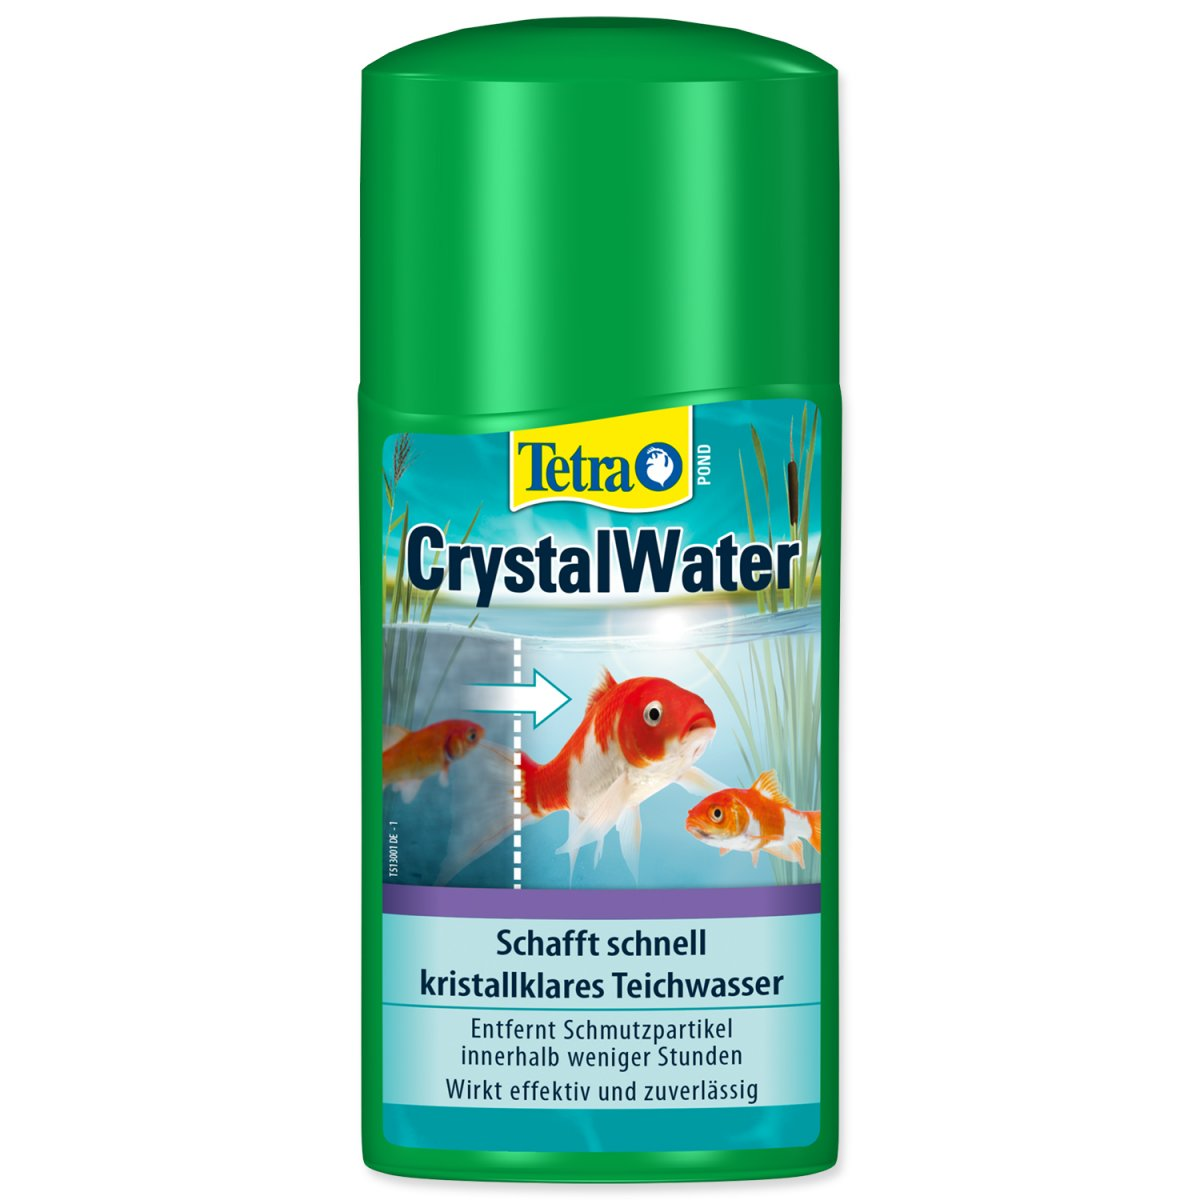 TETRA Pond CrystalWater (250ml)